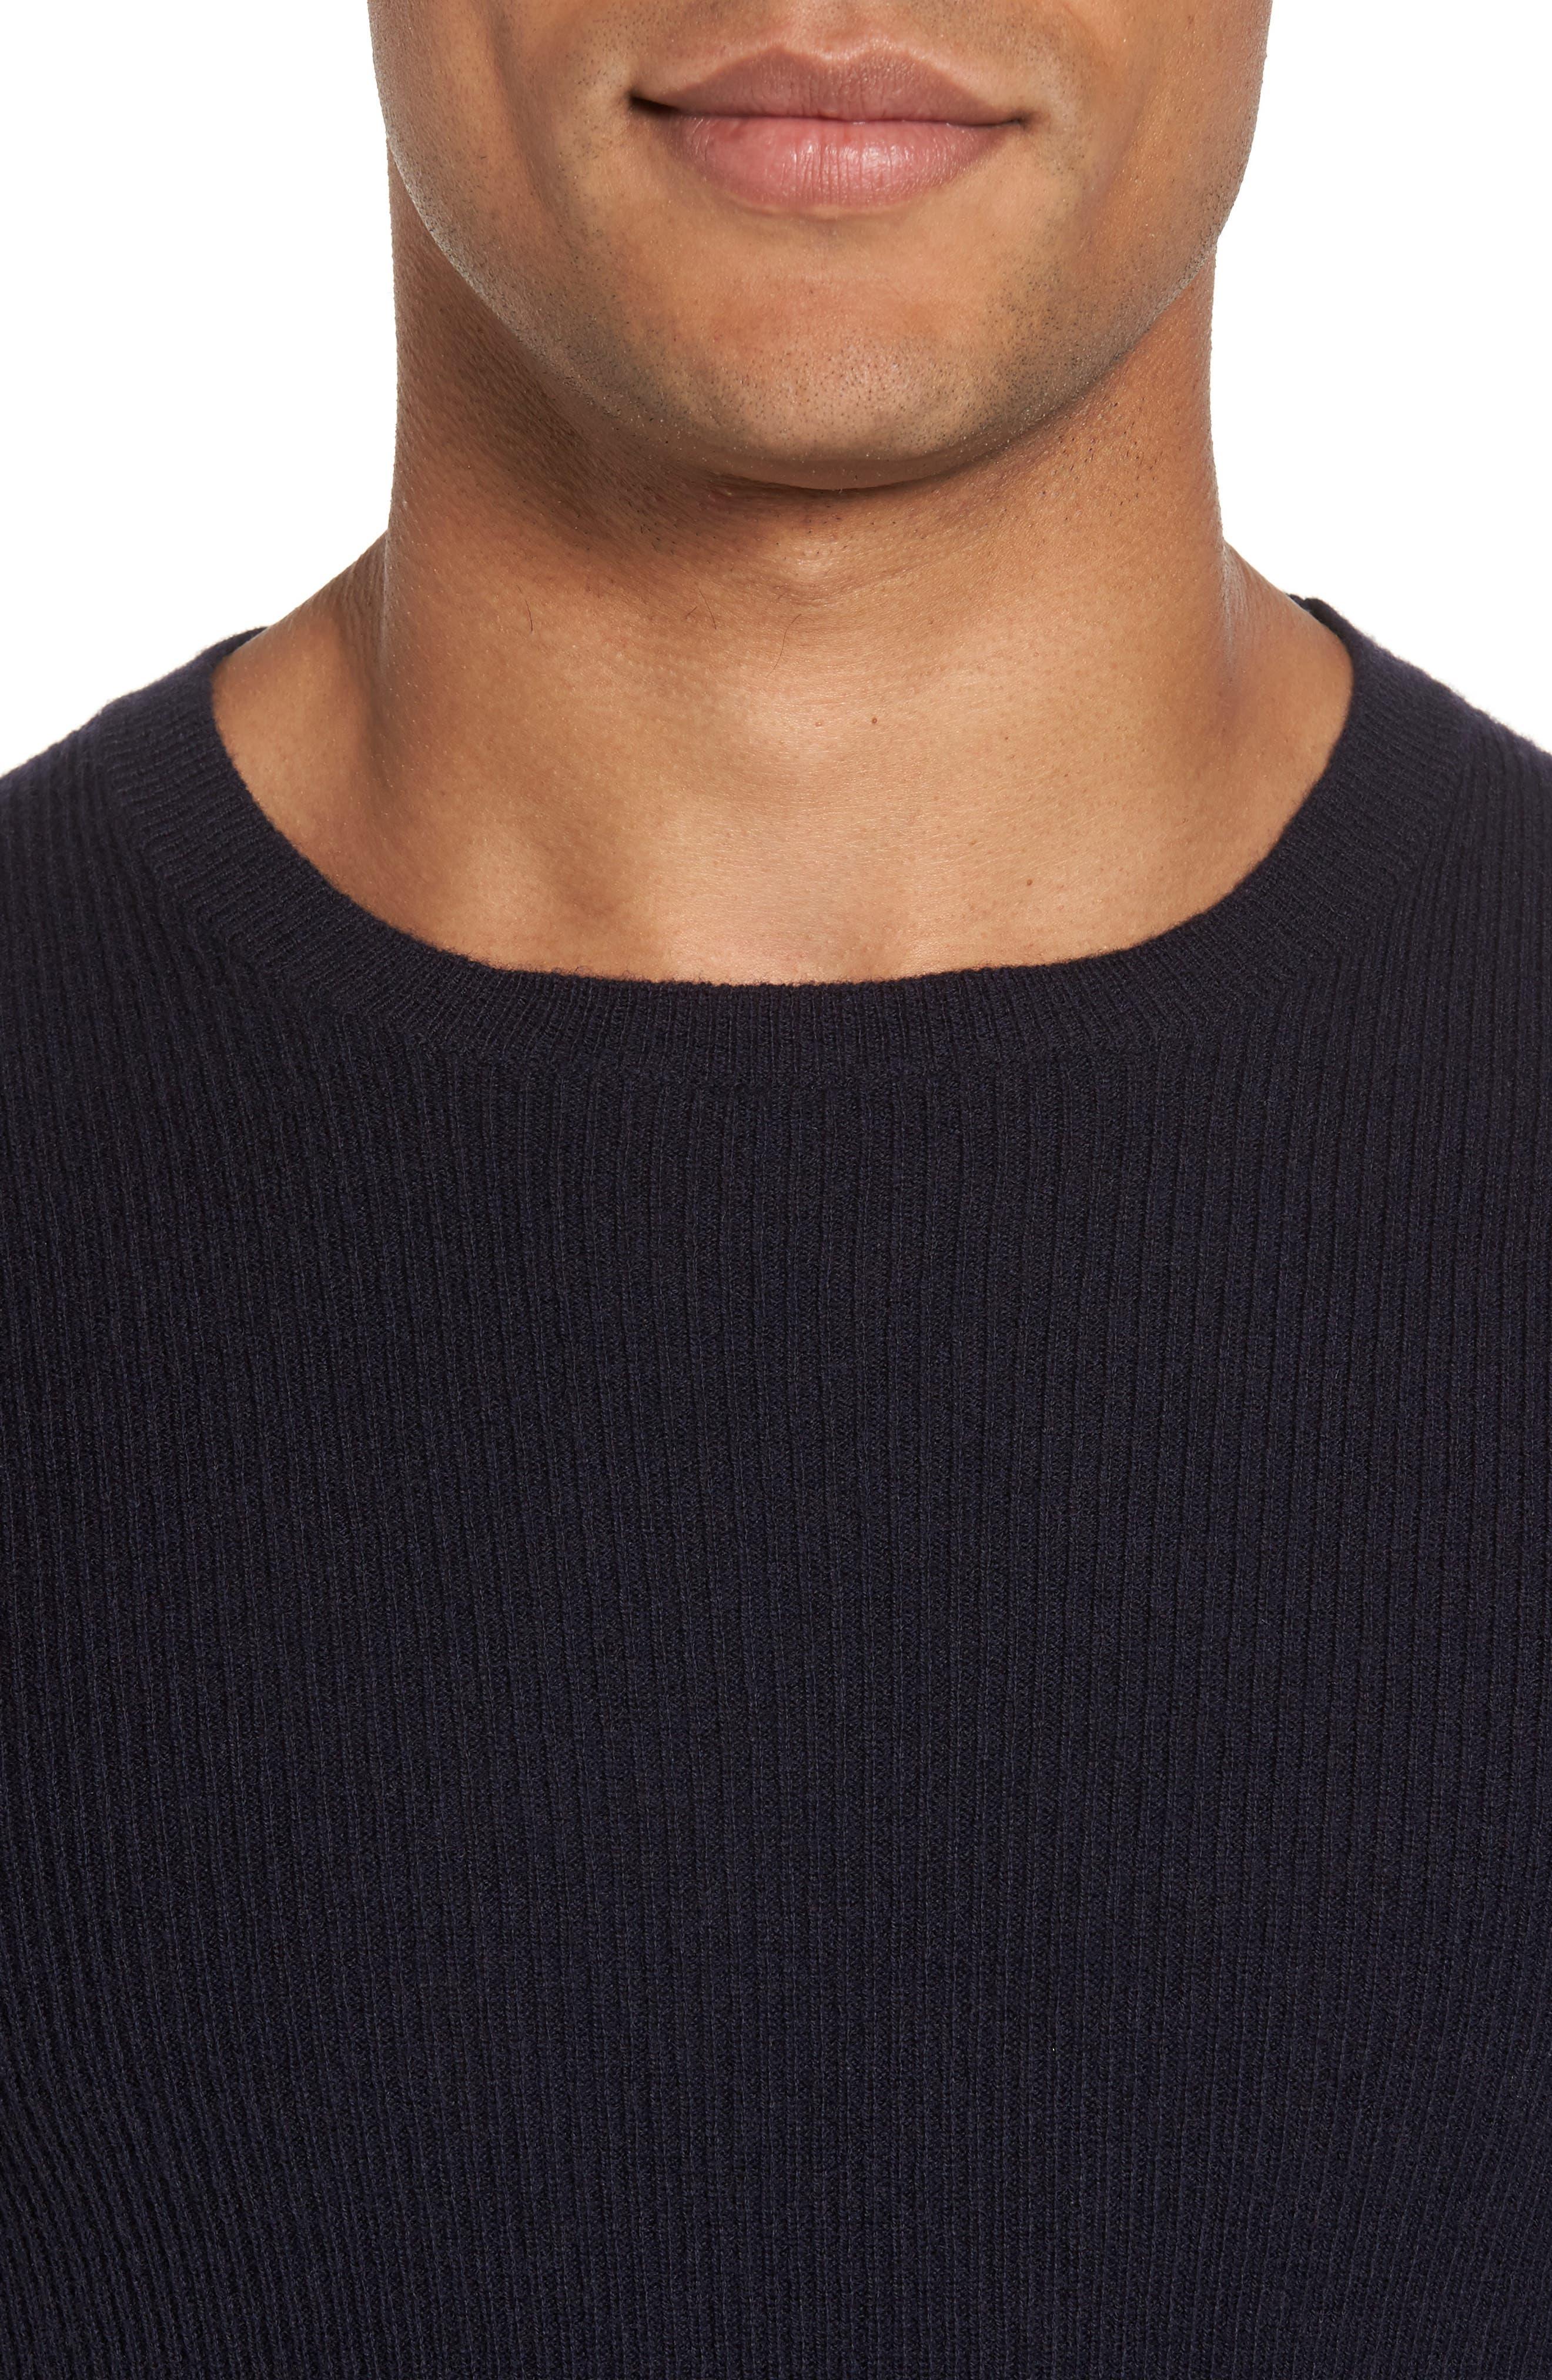 Colorblock Crewneck Sweater,                             Alternate thumbnail 4, color,                             Navy